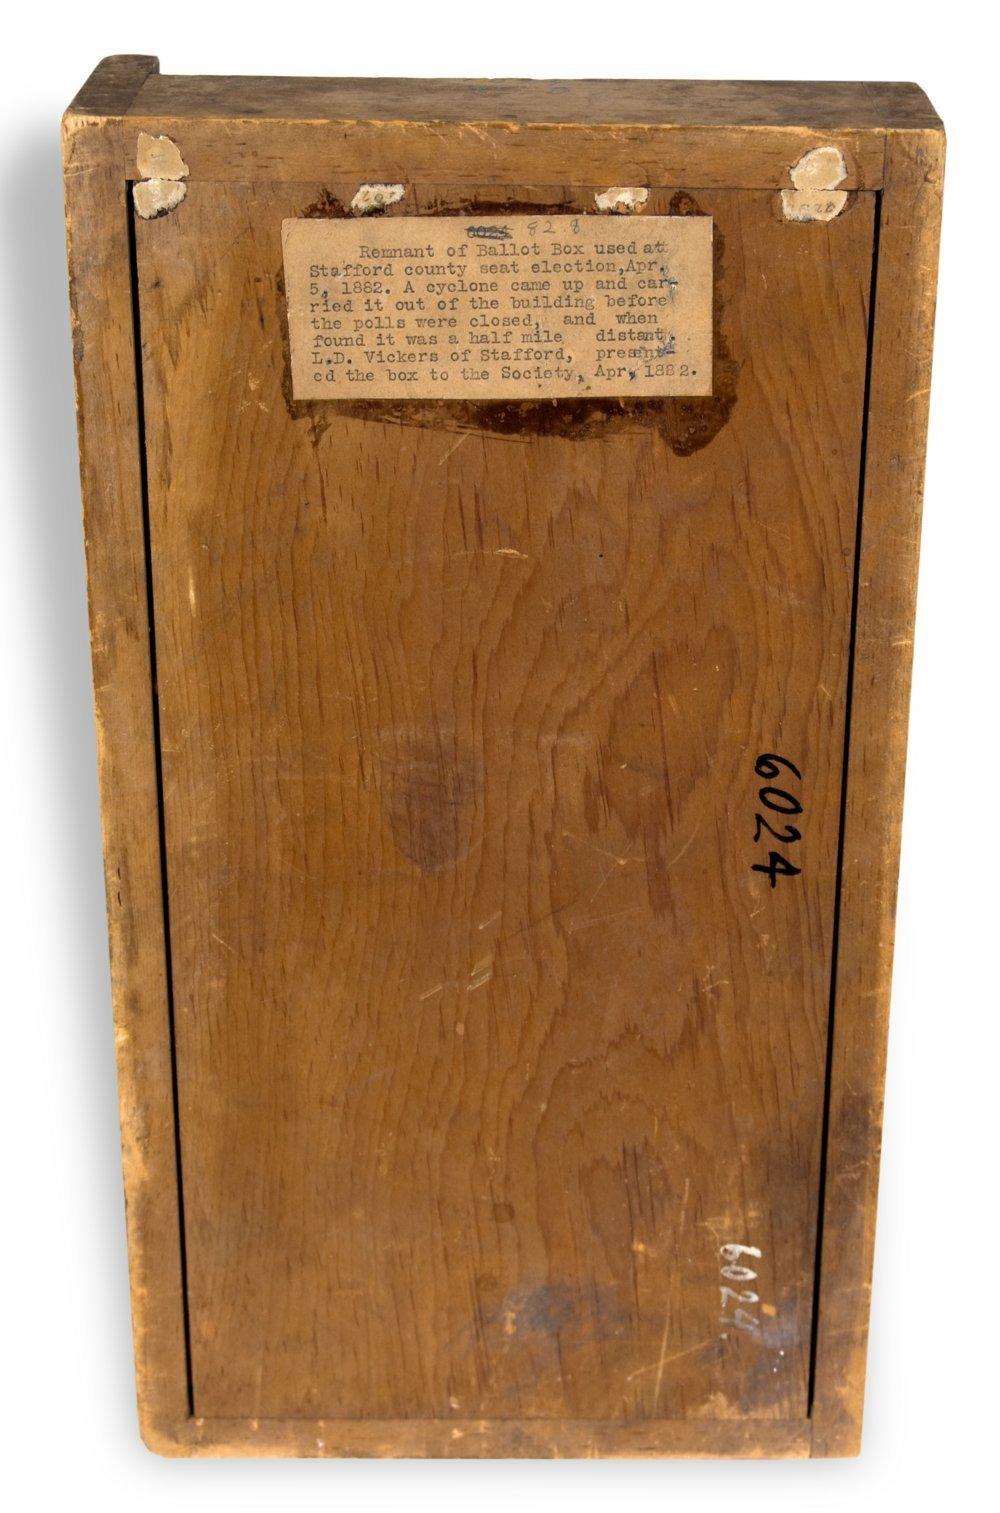 Ballot box fragment - 2